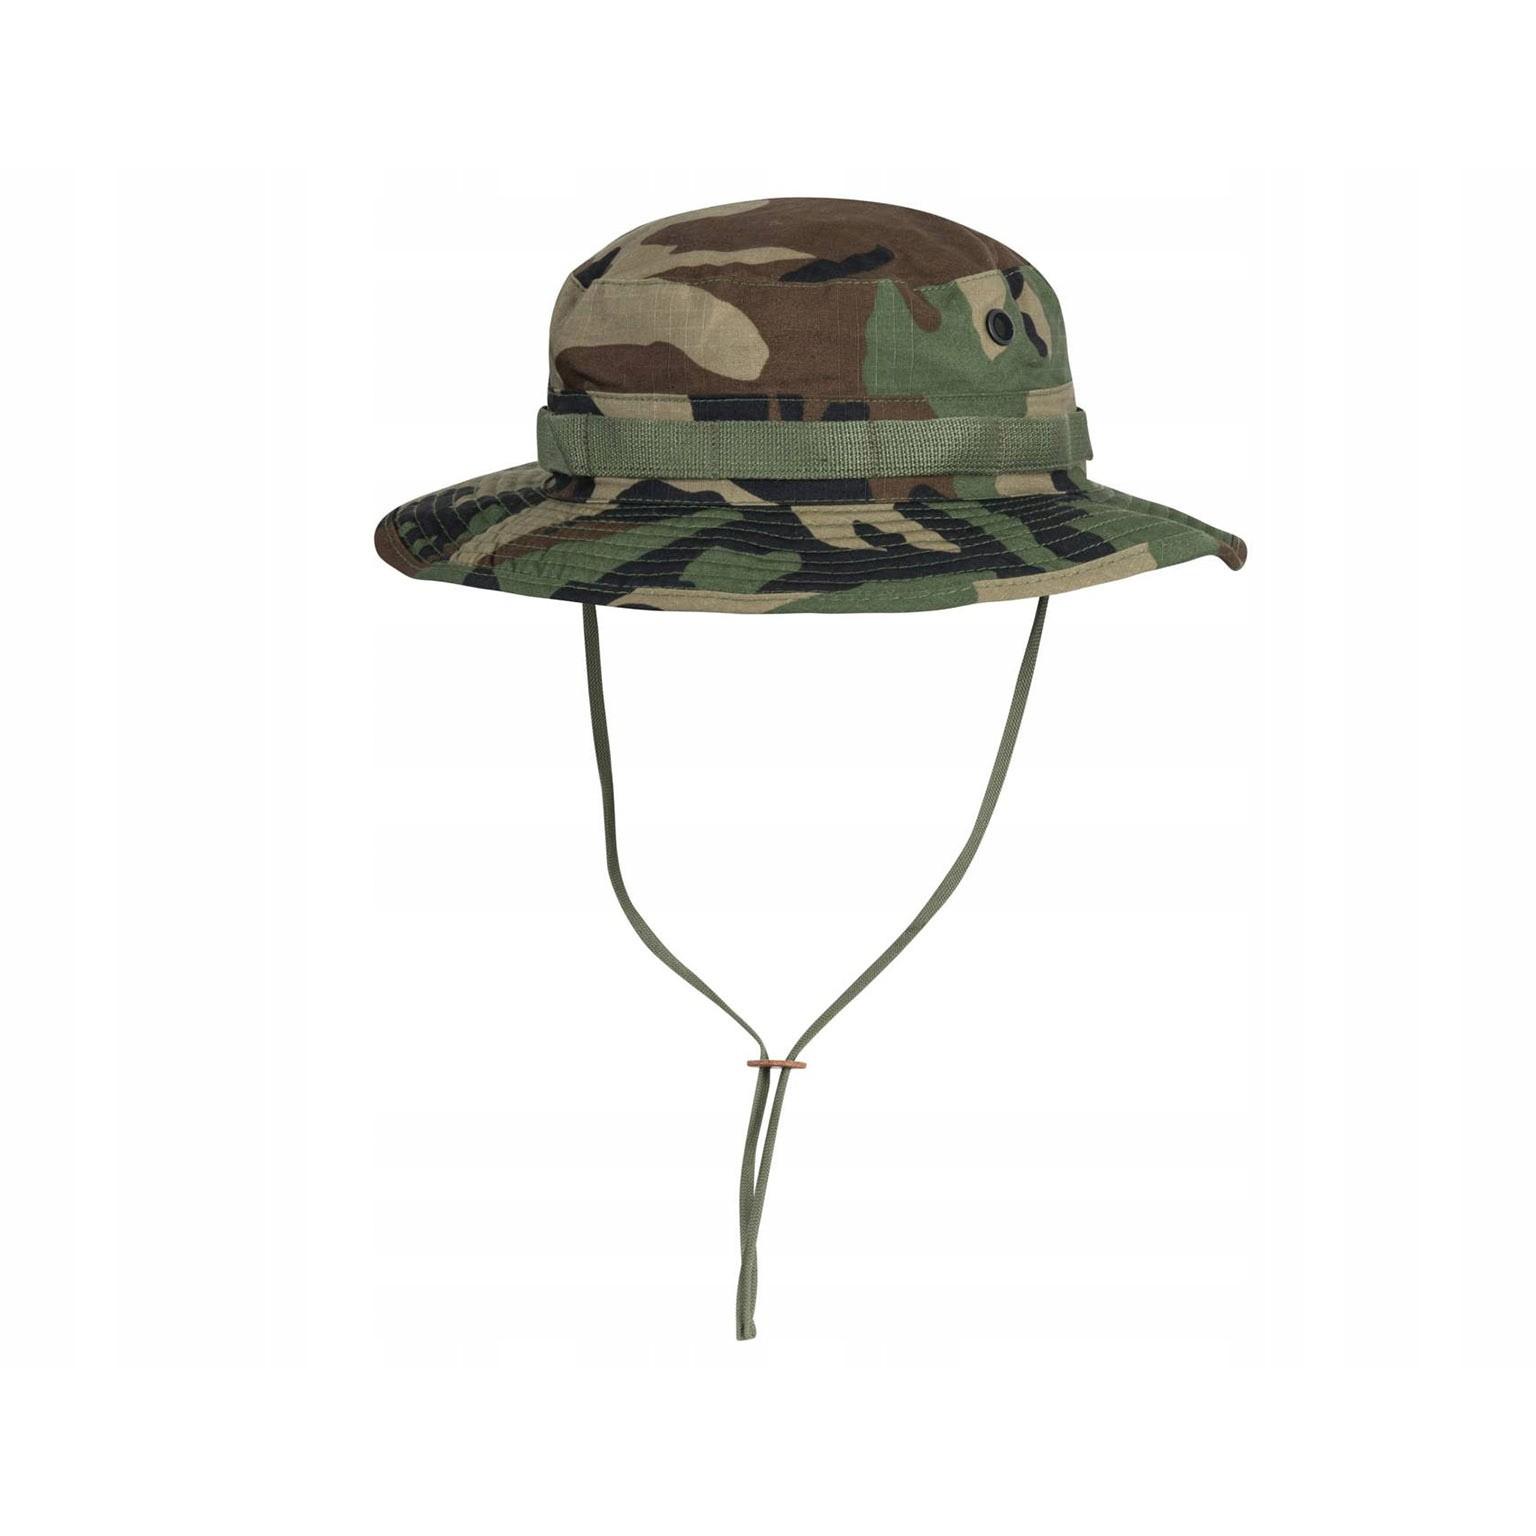 vojenský klobúk Helikon Boonie US Woodland M 57cm megamix.sk